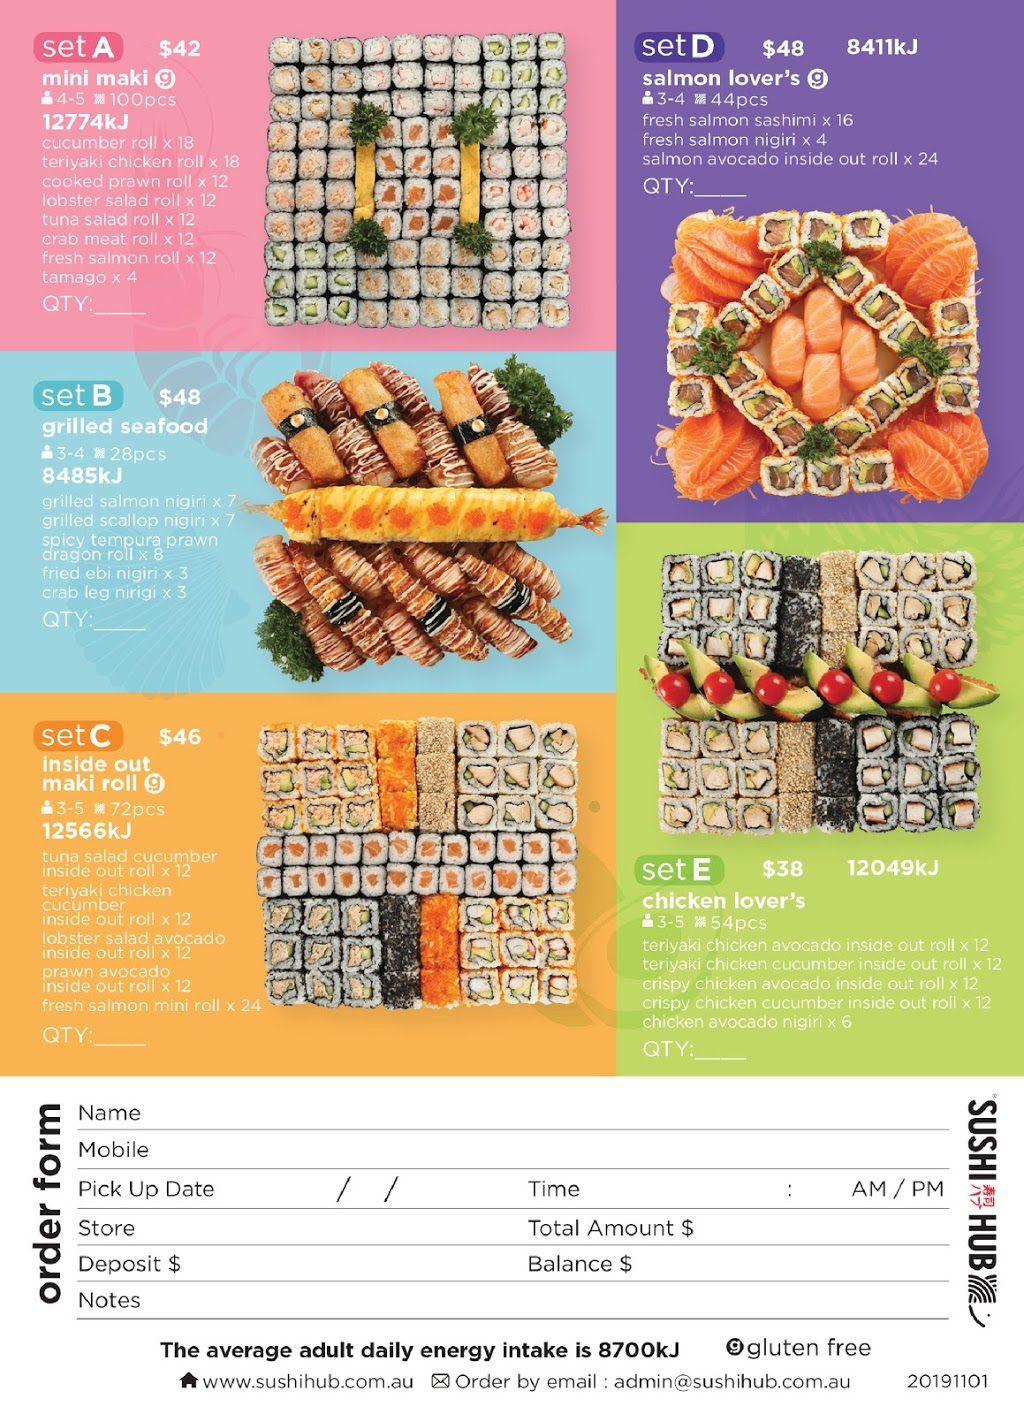 Sushi Hub Chirnside Park Restaurant 239 241 Maroondah Highway L01 K147 Chirnside Park Vic 3116 Australia